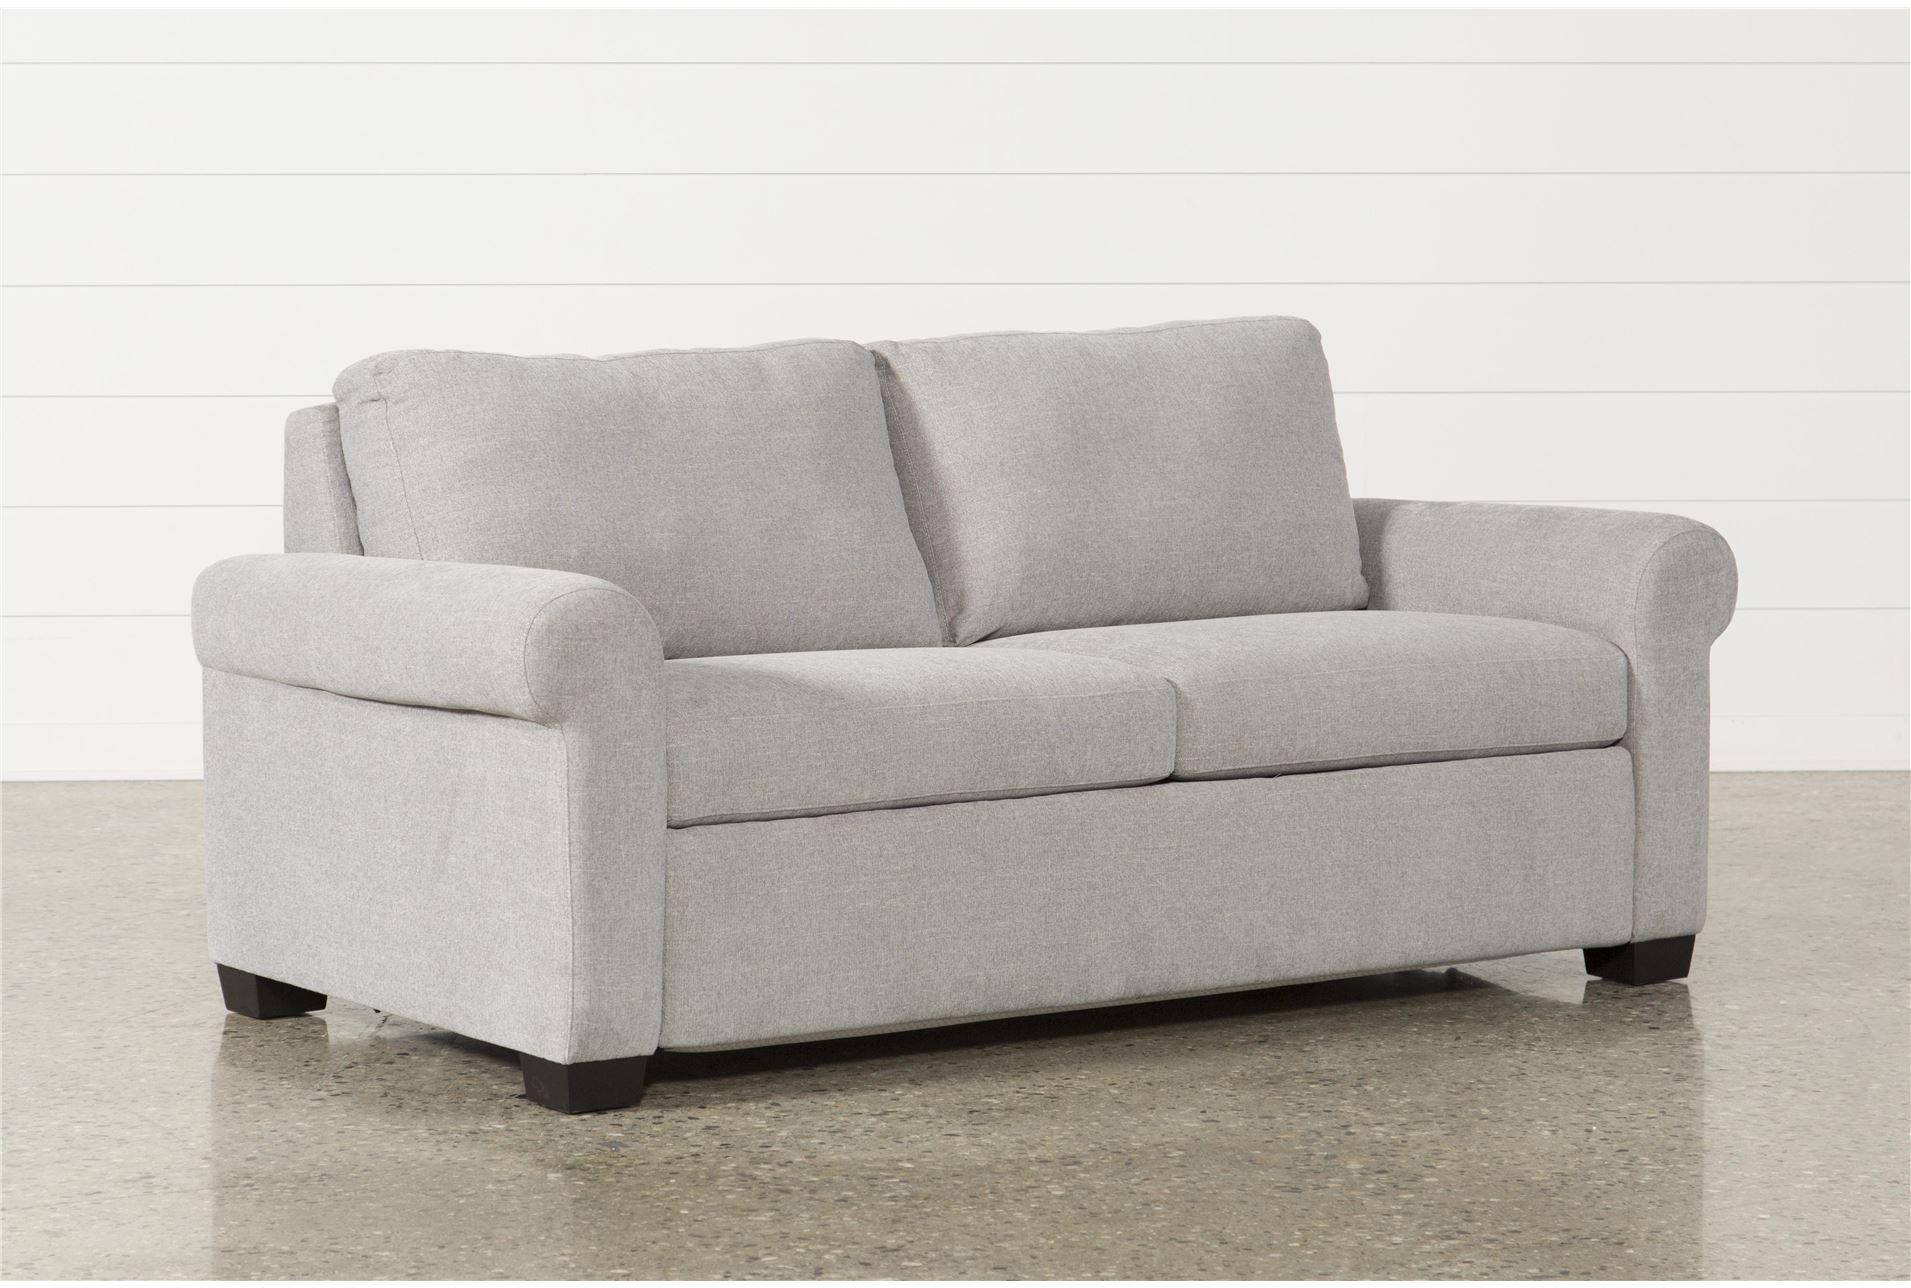 Alexis Silverpine Queen Sofa Sleeper   Living Spaces